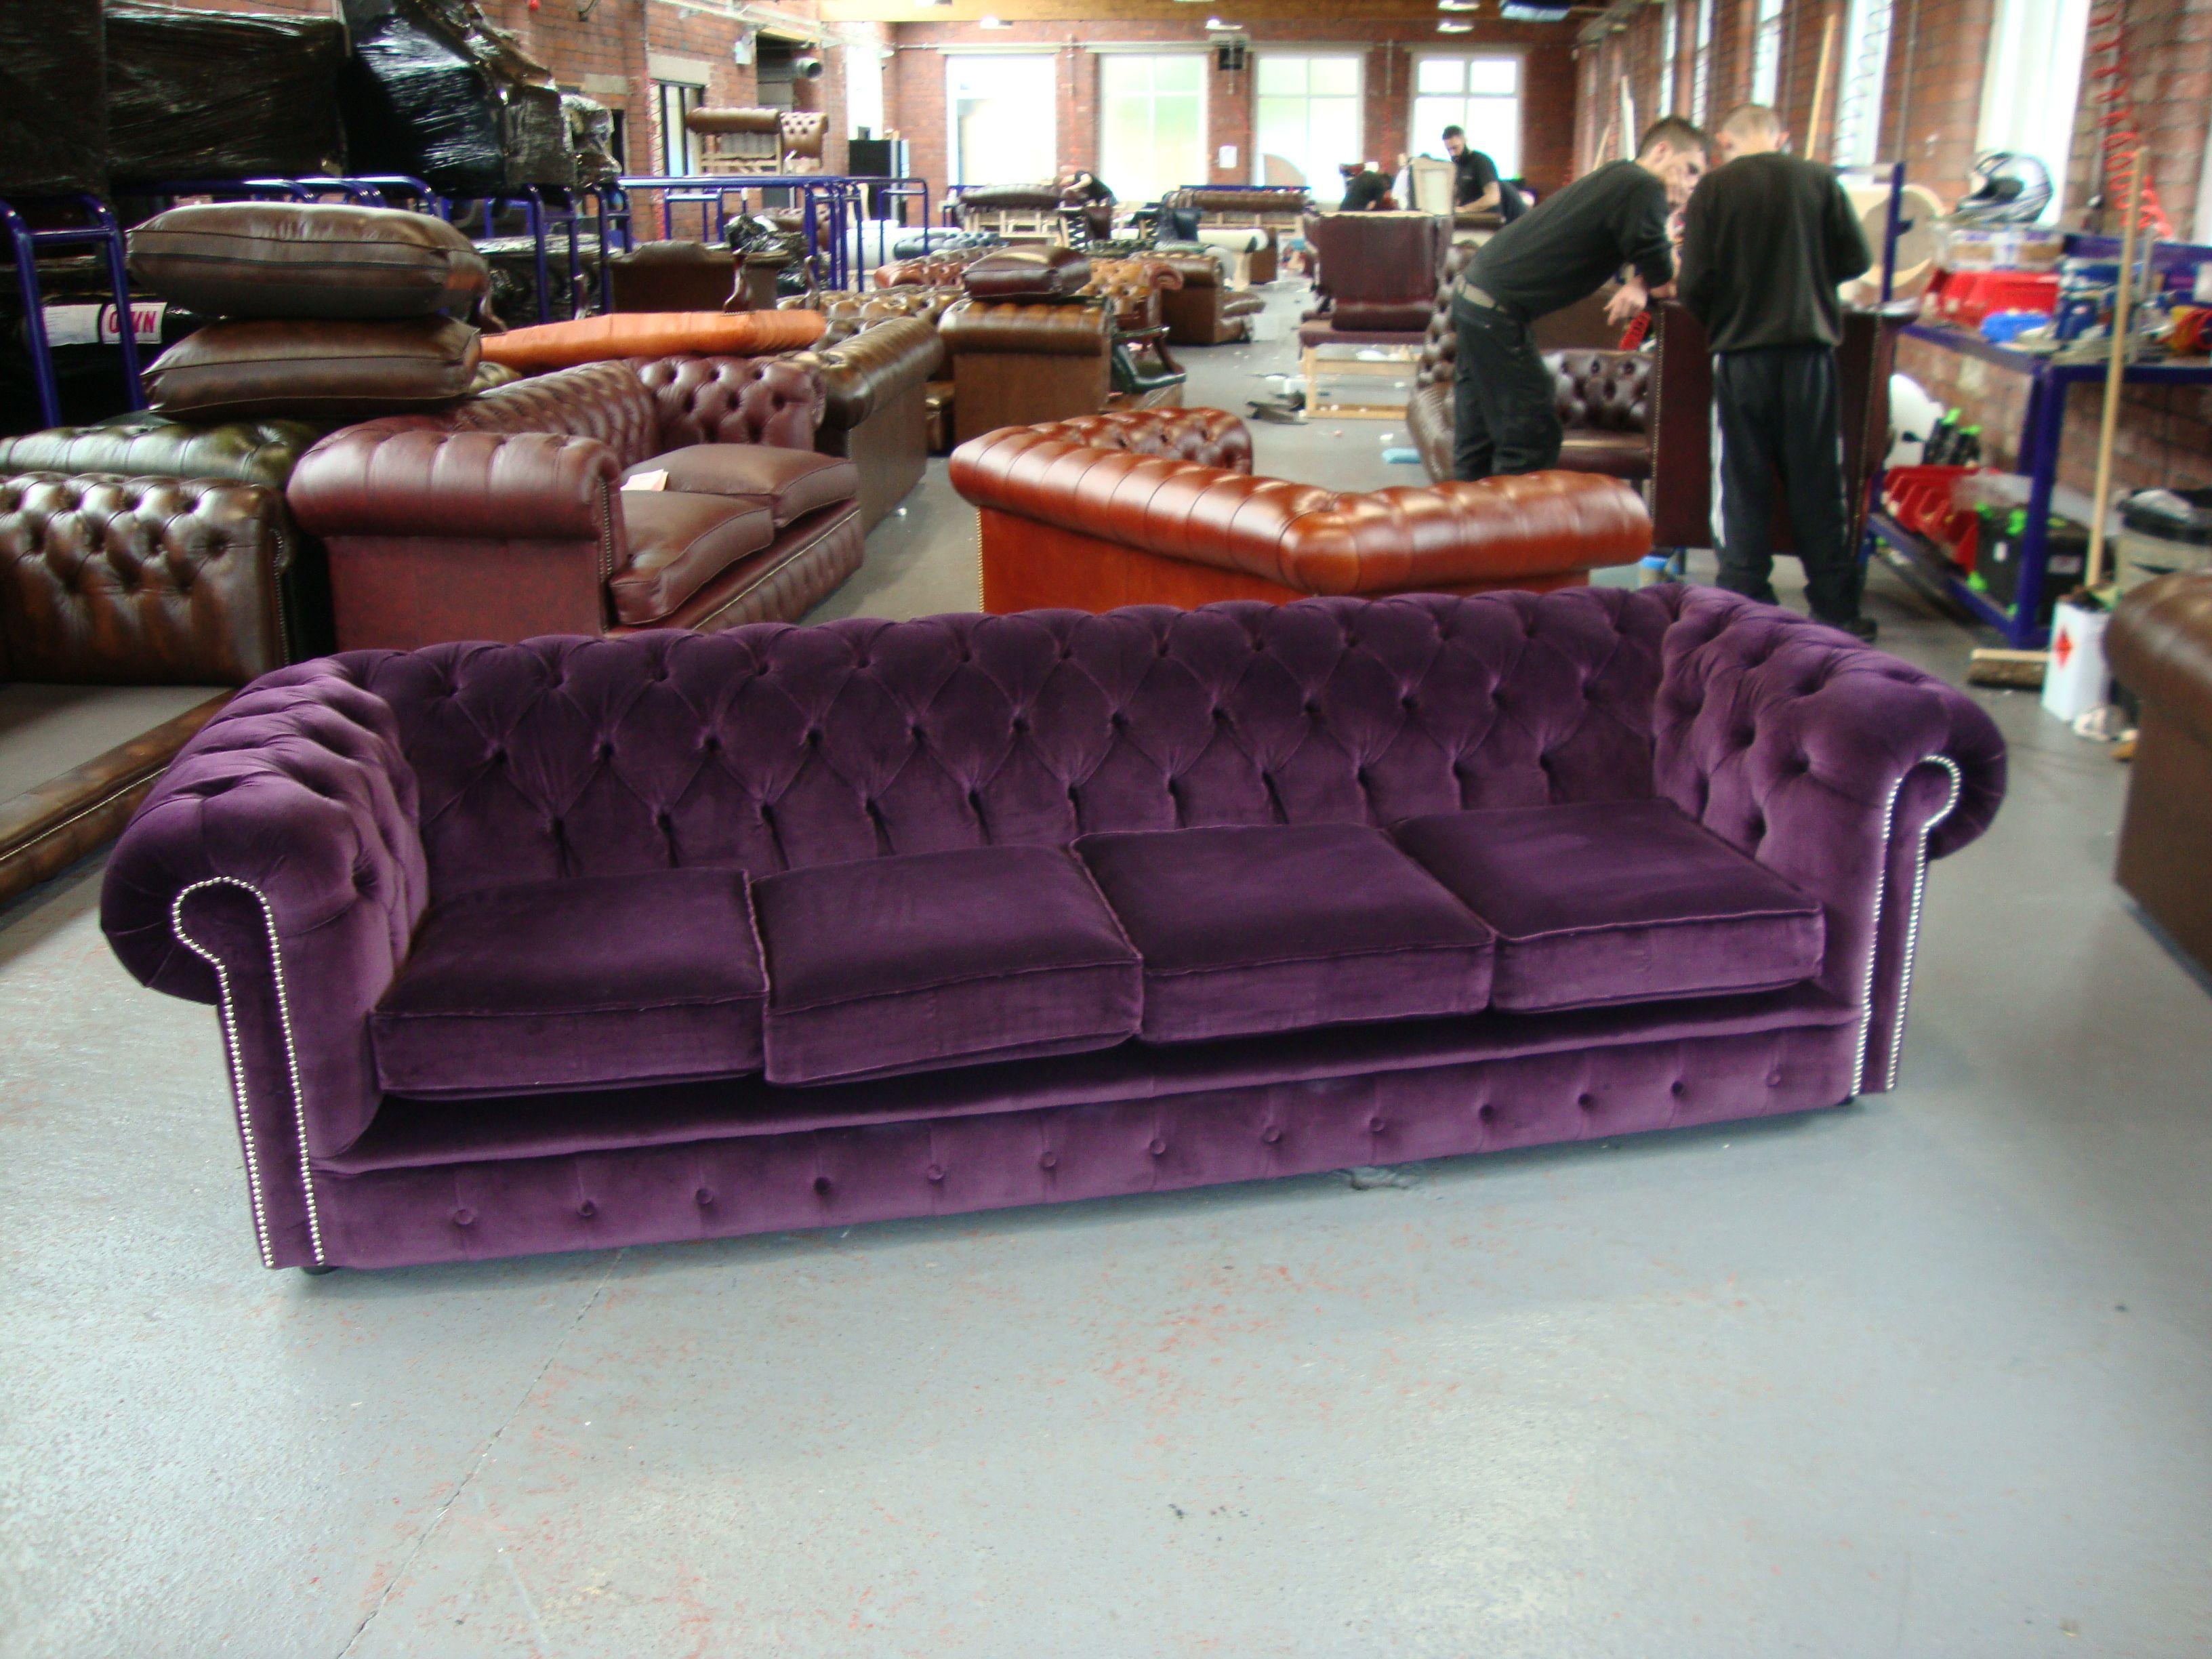 Belchamp Chesterfield Tufted 4 Seater Sofa In Aubergine Plum